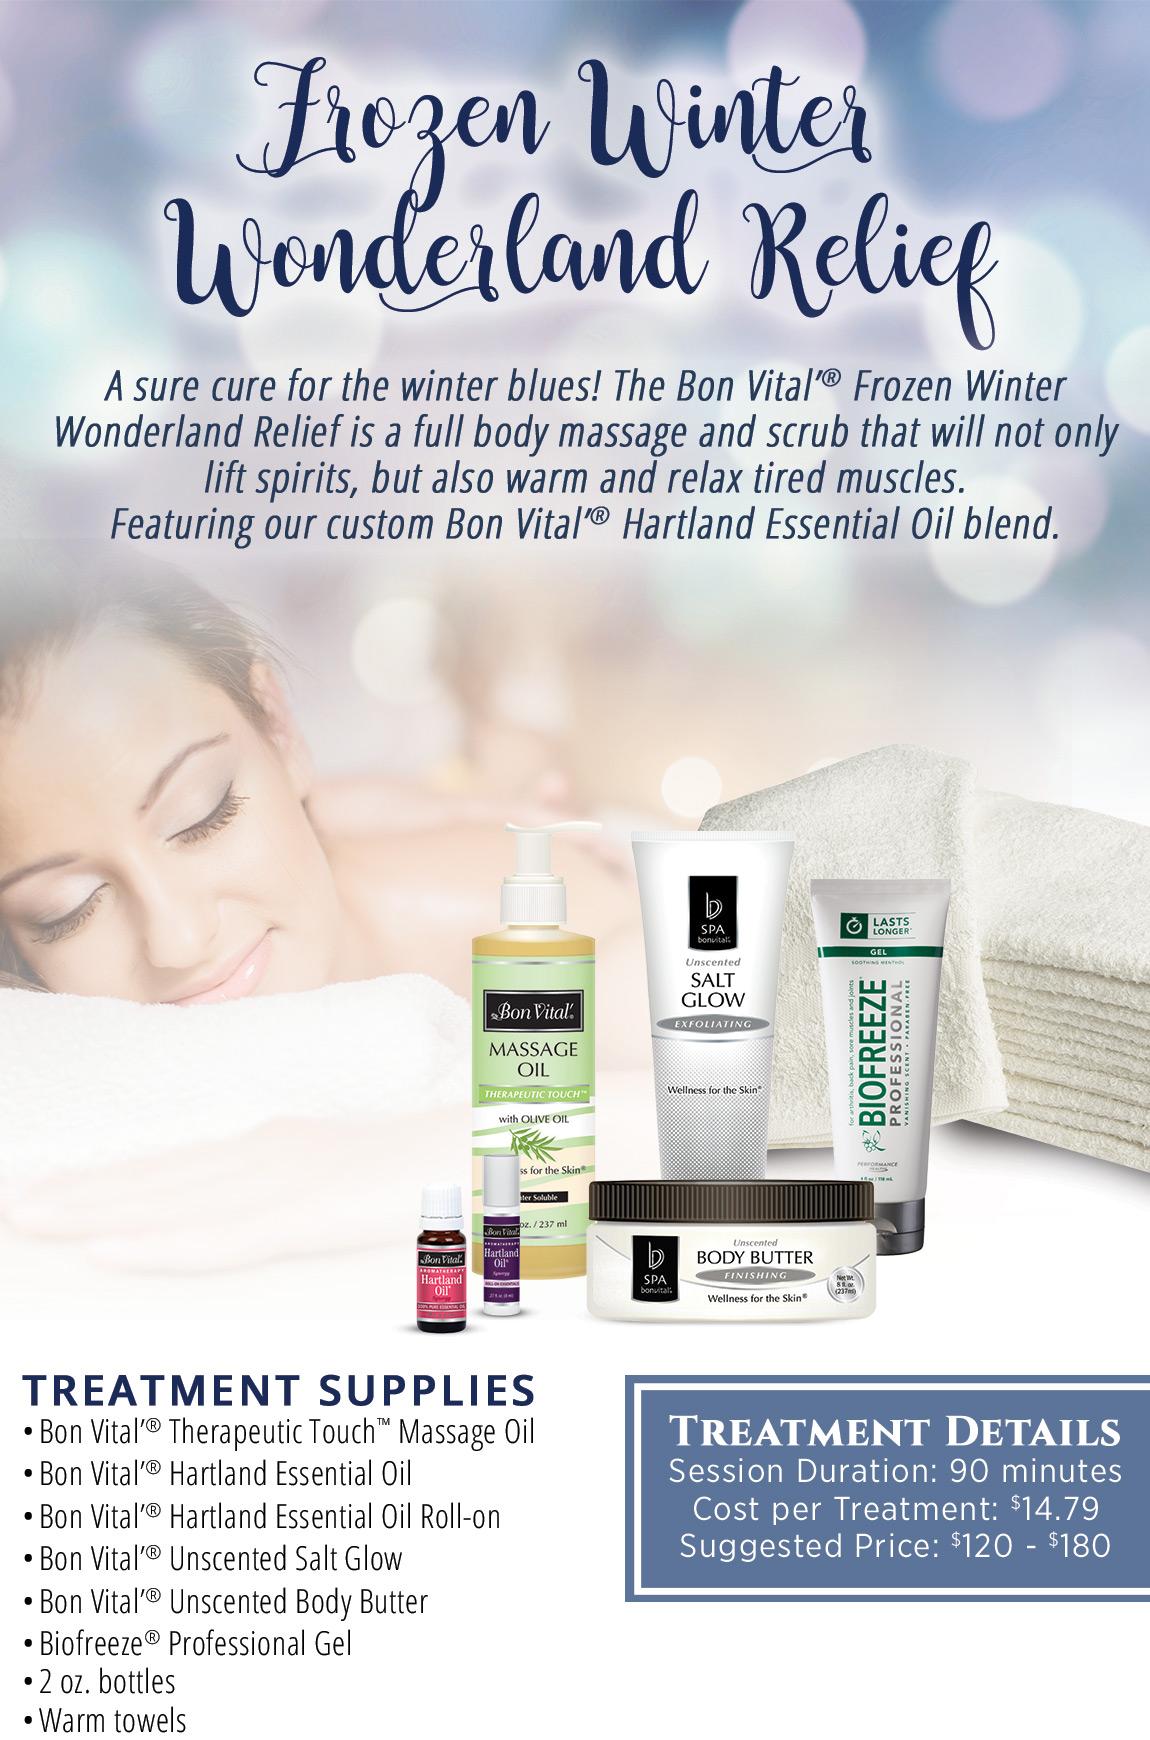 Frozen Winter Wonderland Relief Bon Vital' Protocol